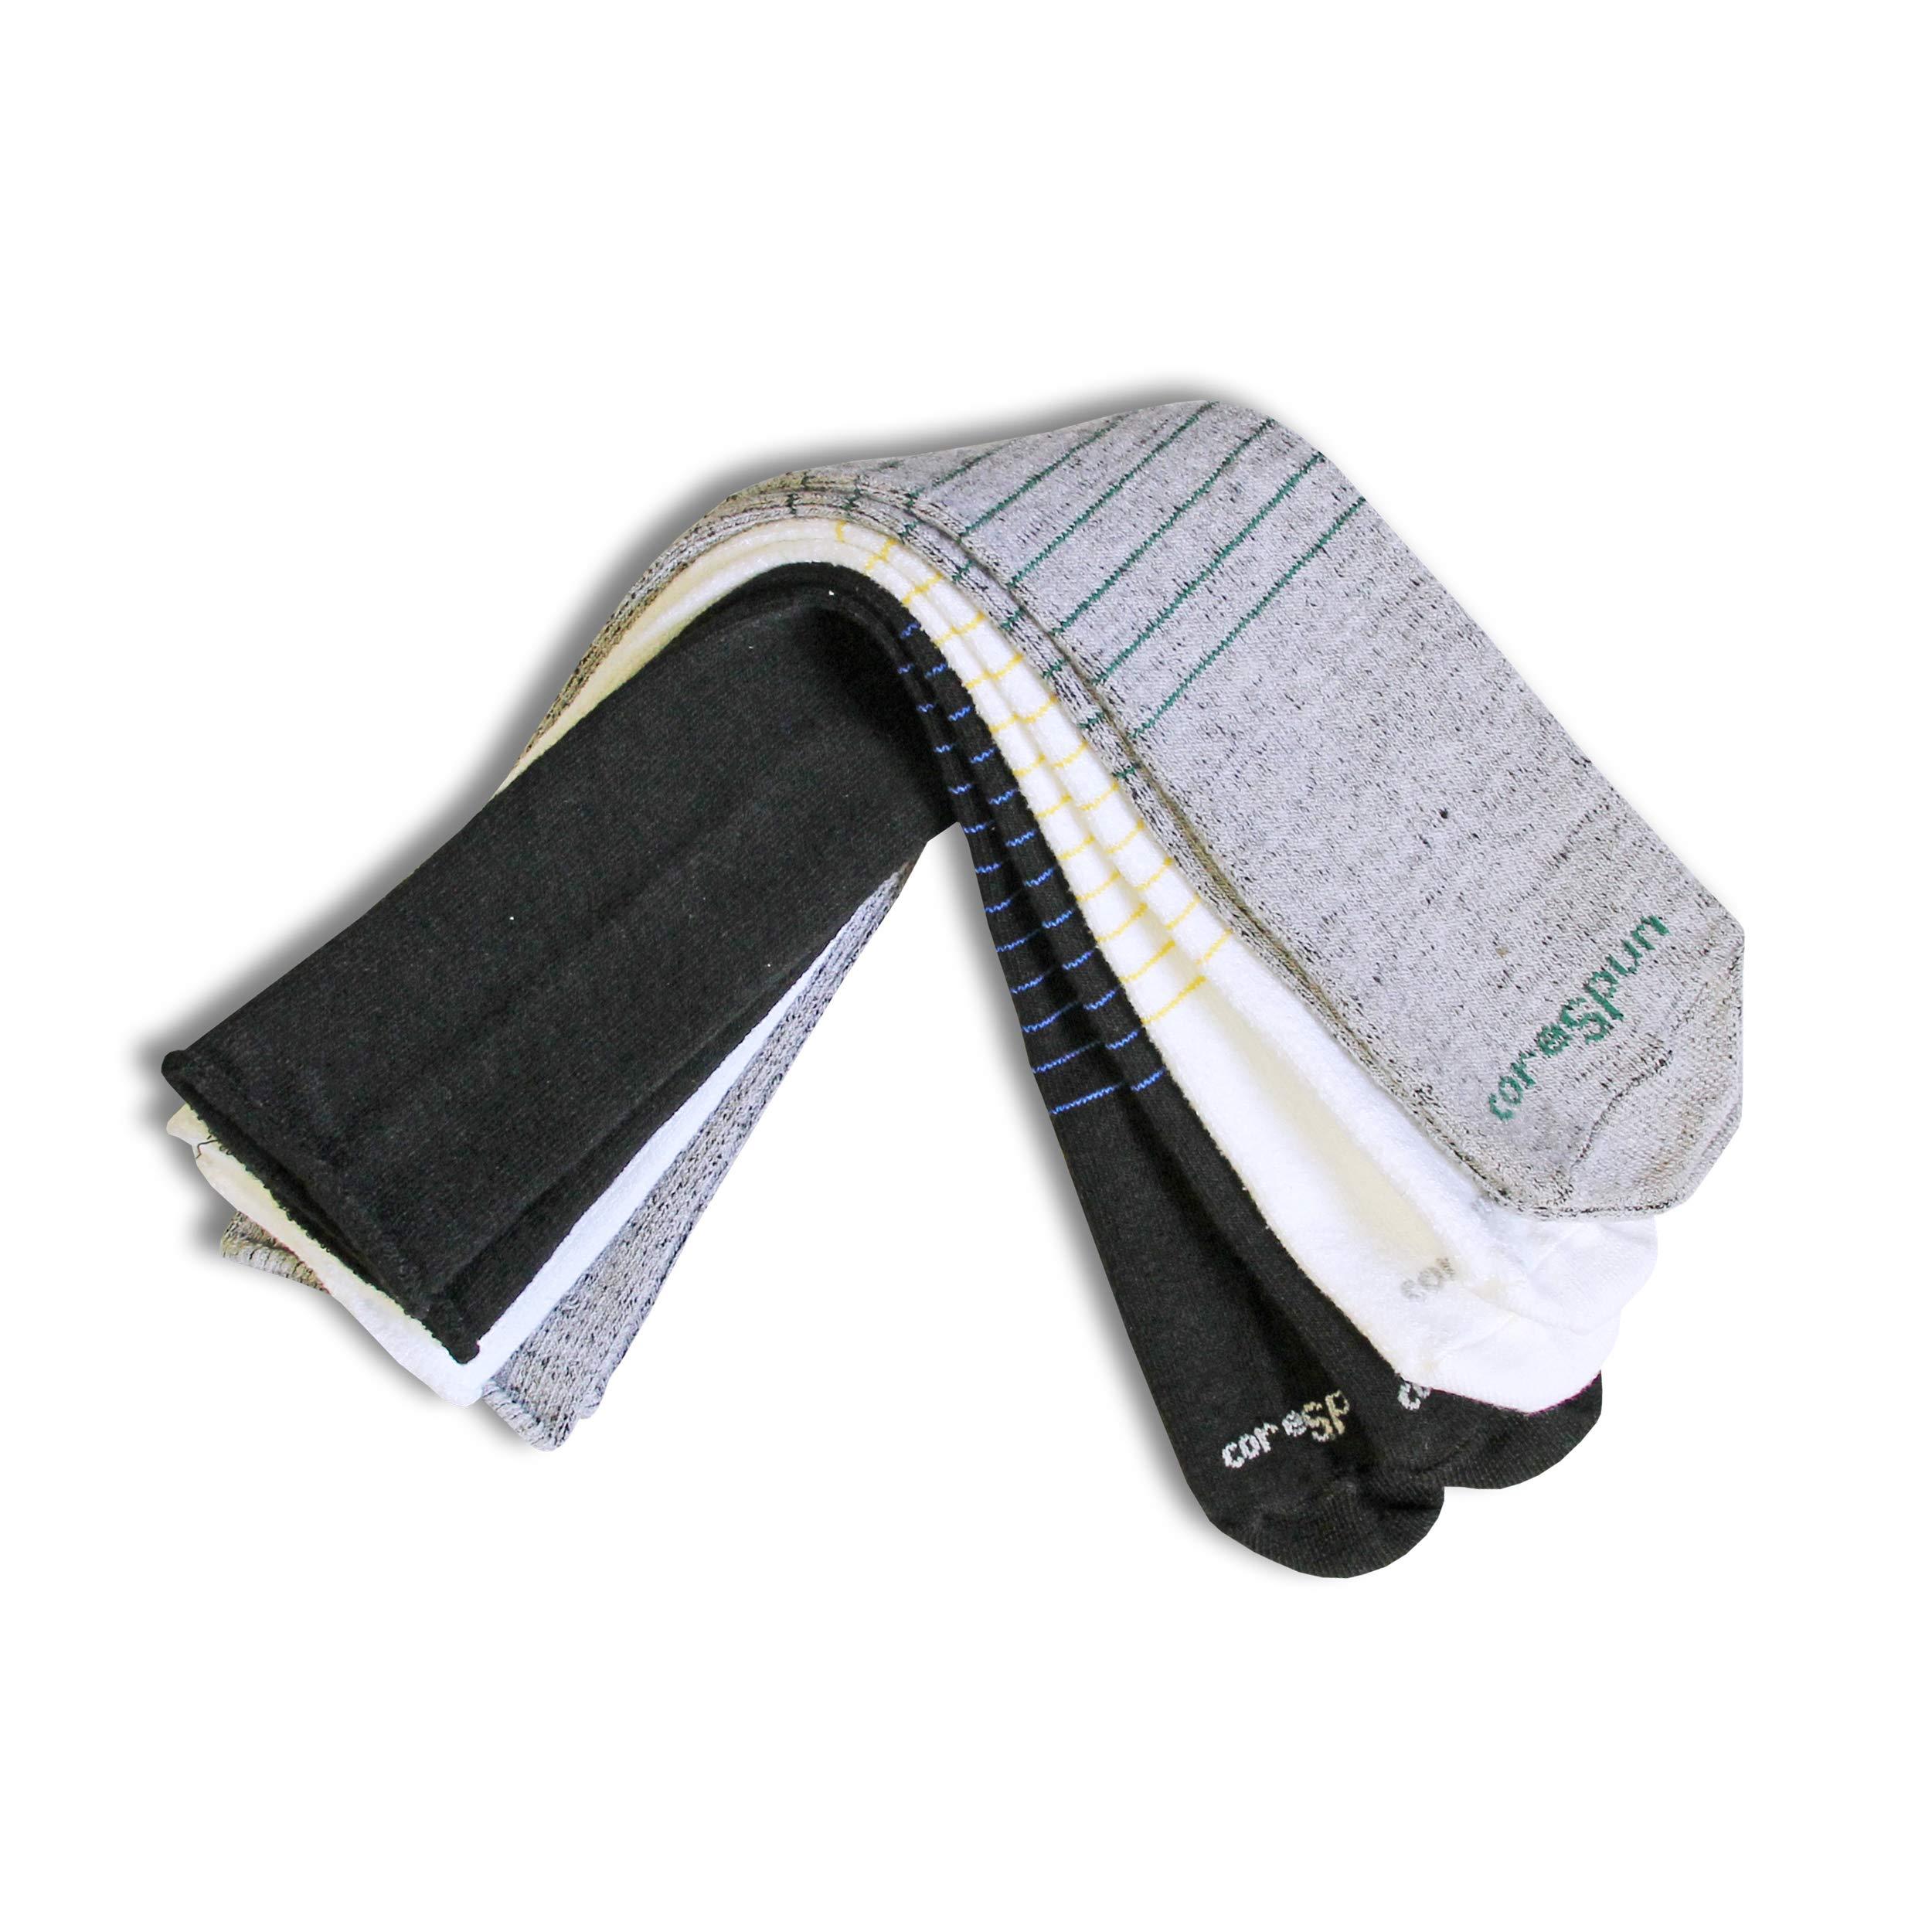 Core-Spun Patterned Child AFO Socks by SmartKnit- Halos 3 Pack - White/Grey/Black - Child Small by Core-spun